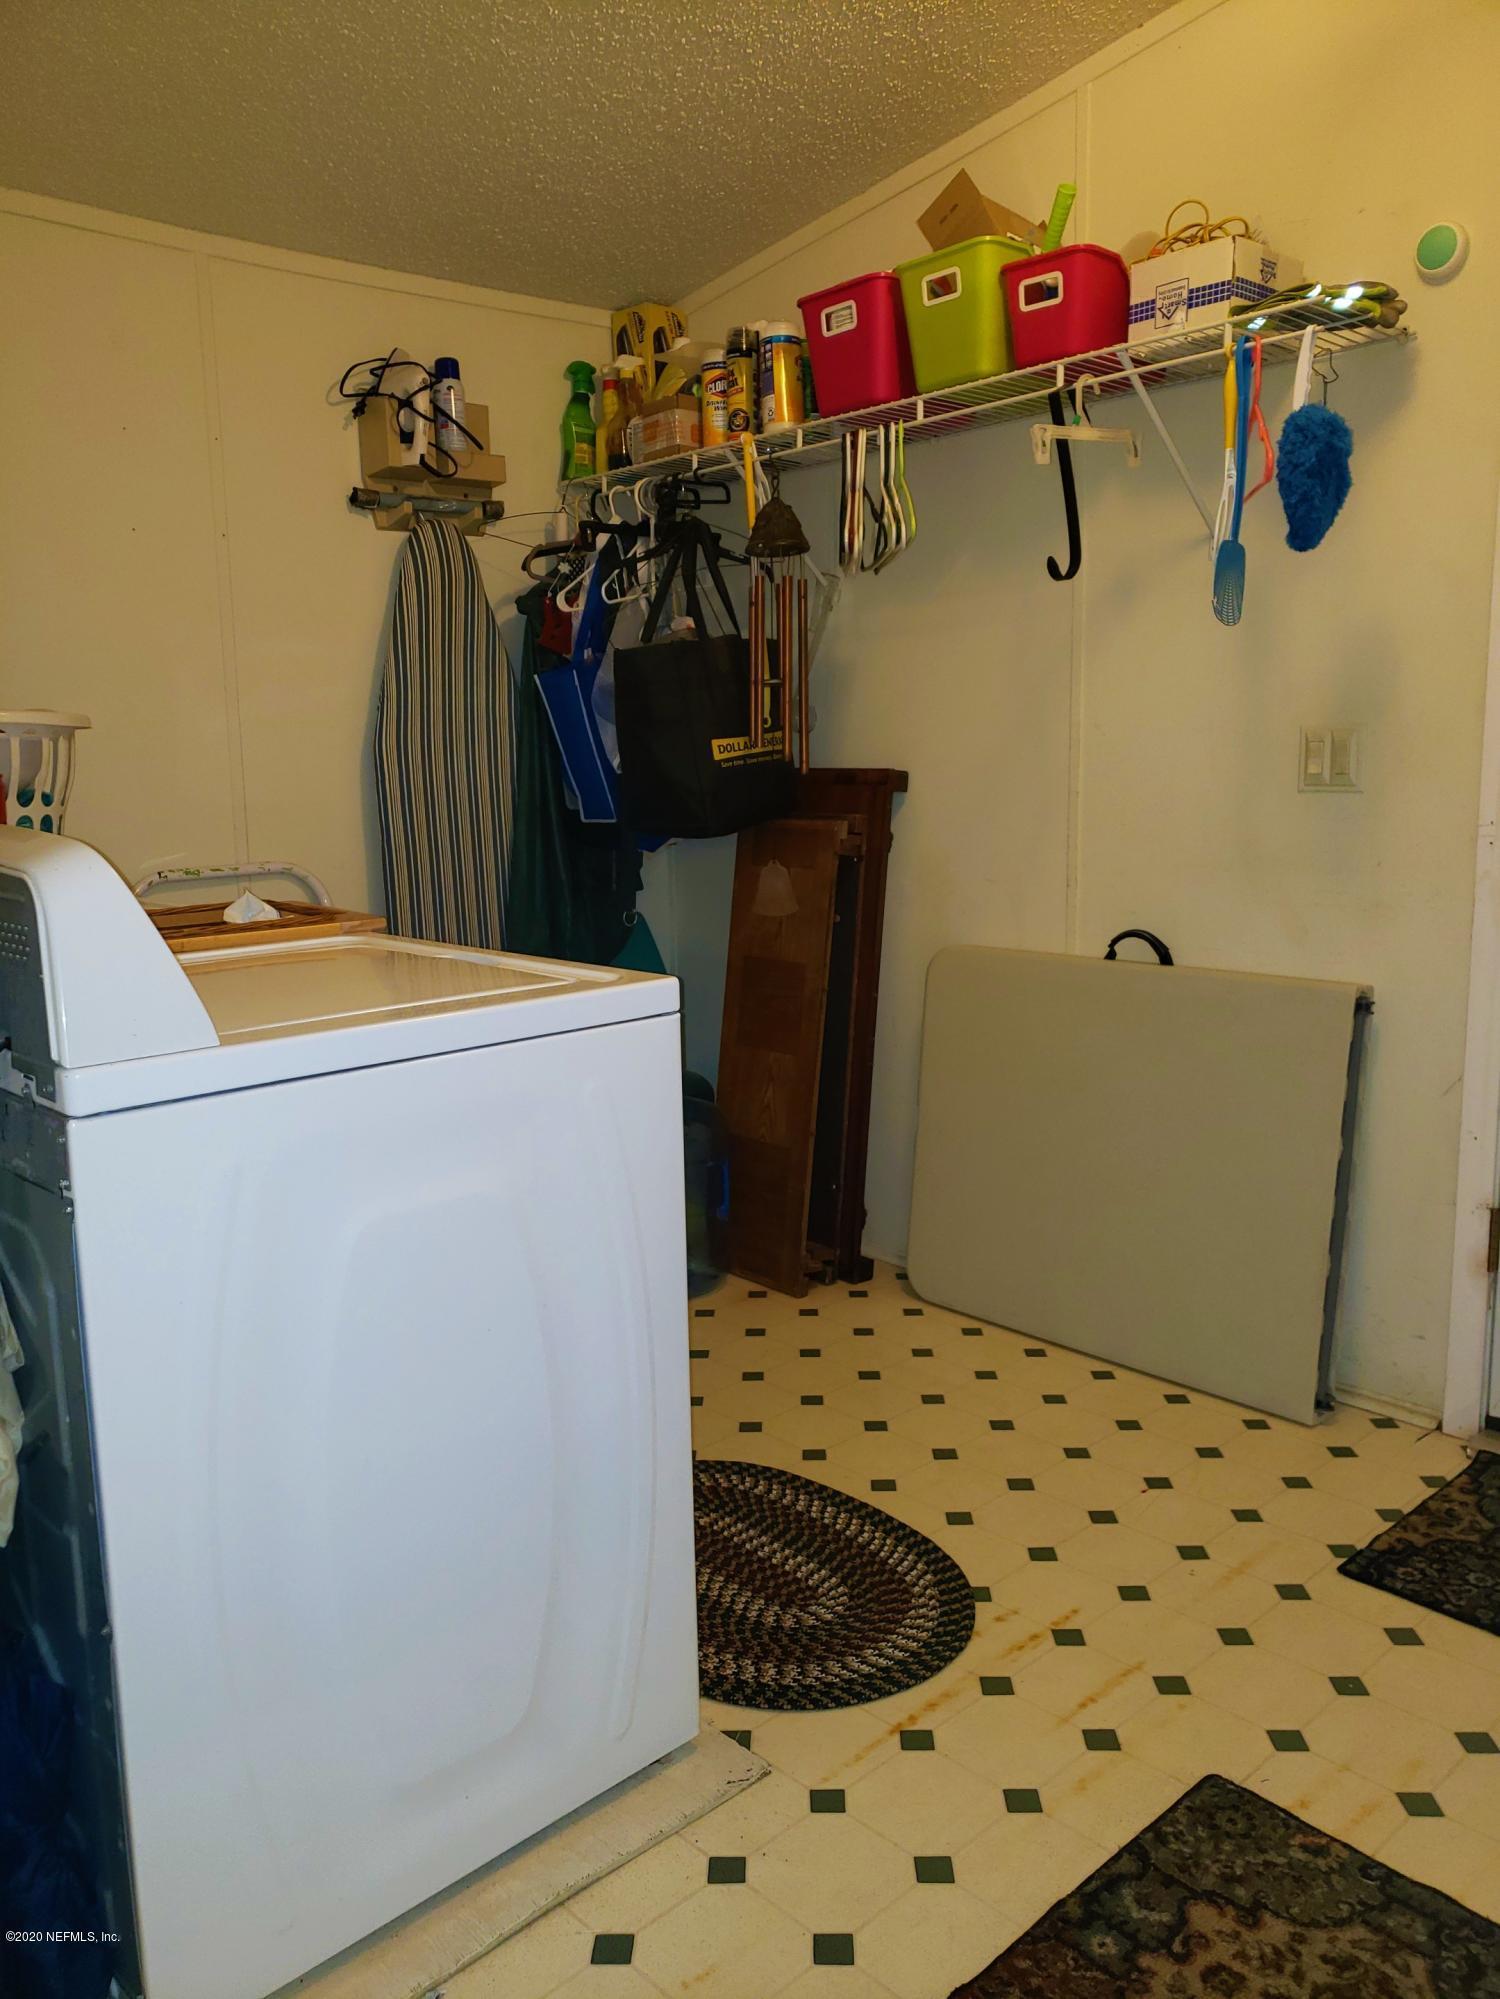 7731 167TH, TRENTON, FLORIDA 32693, 3 Bedrooms Bedrooms, ,2 BathroomsBathrooms,Residential,For sale,167TH,1059915